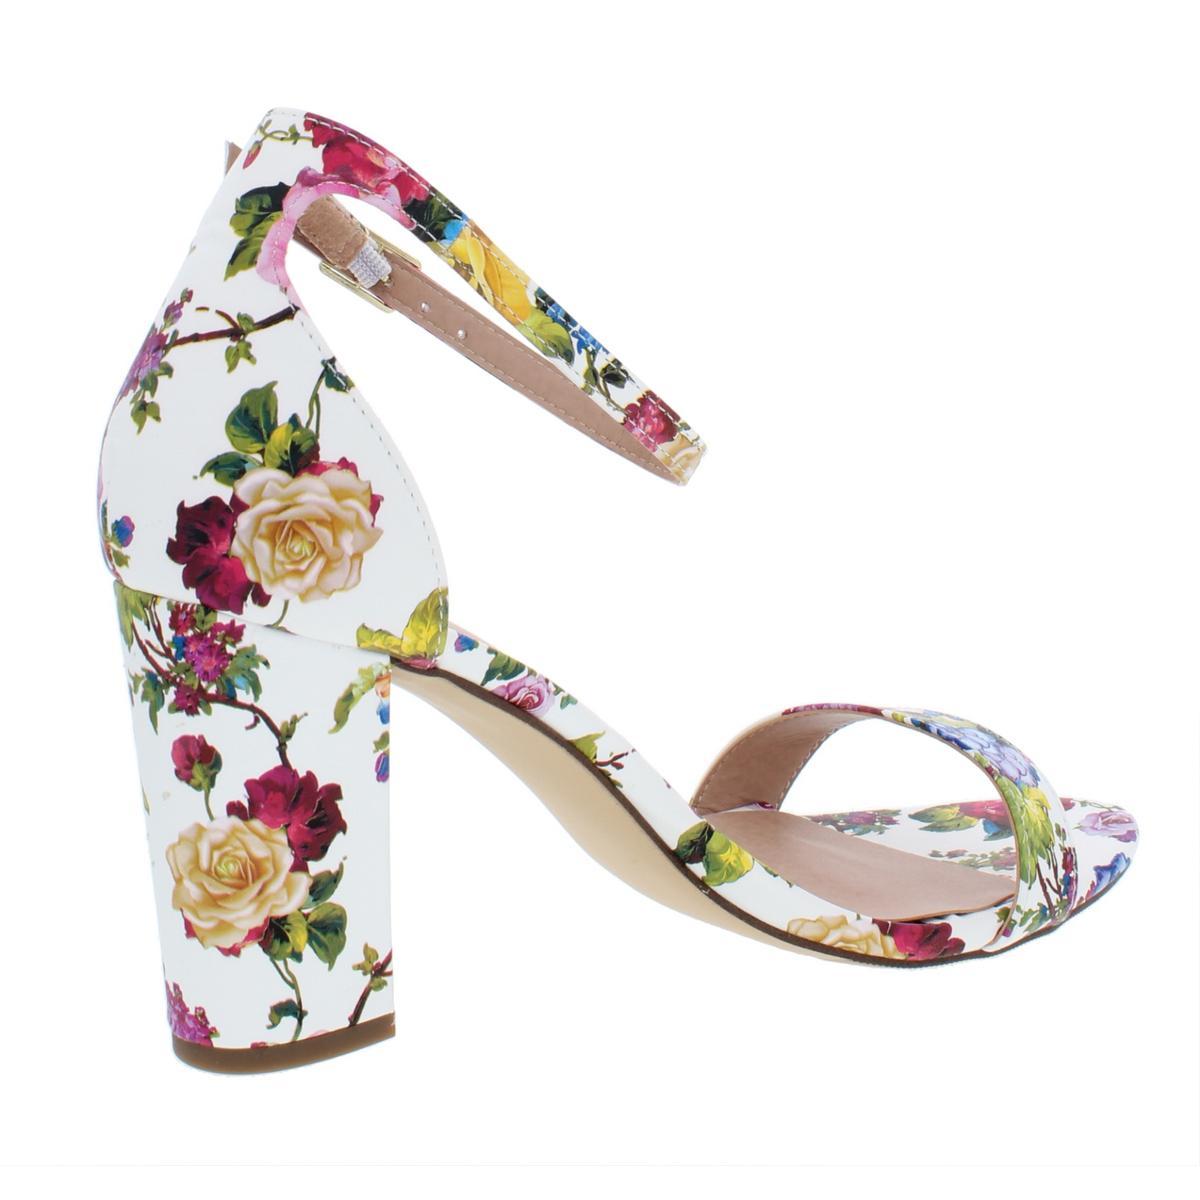 Madden-Girl-Womens-Beella-Heels-Dress-Sandals-Shoes-BHFO-0922 thumbnail 10